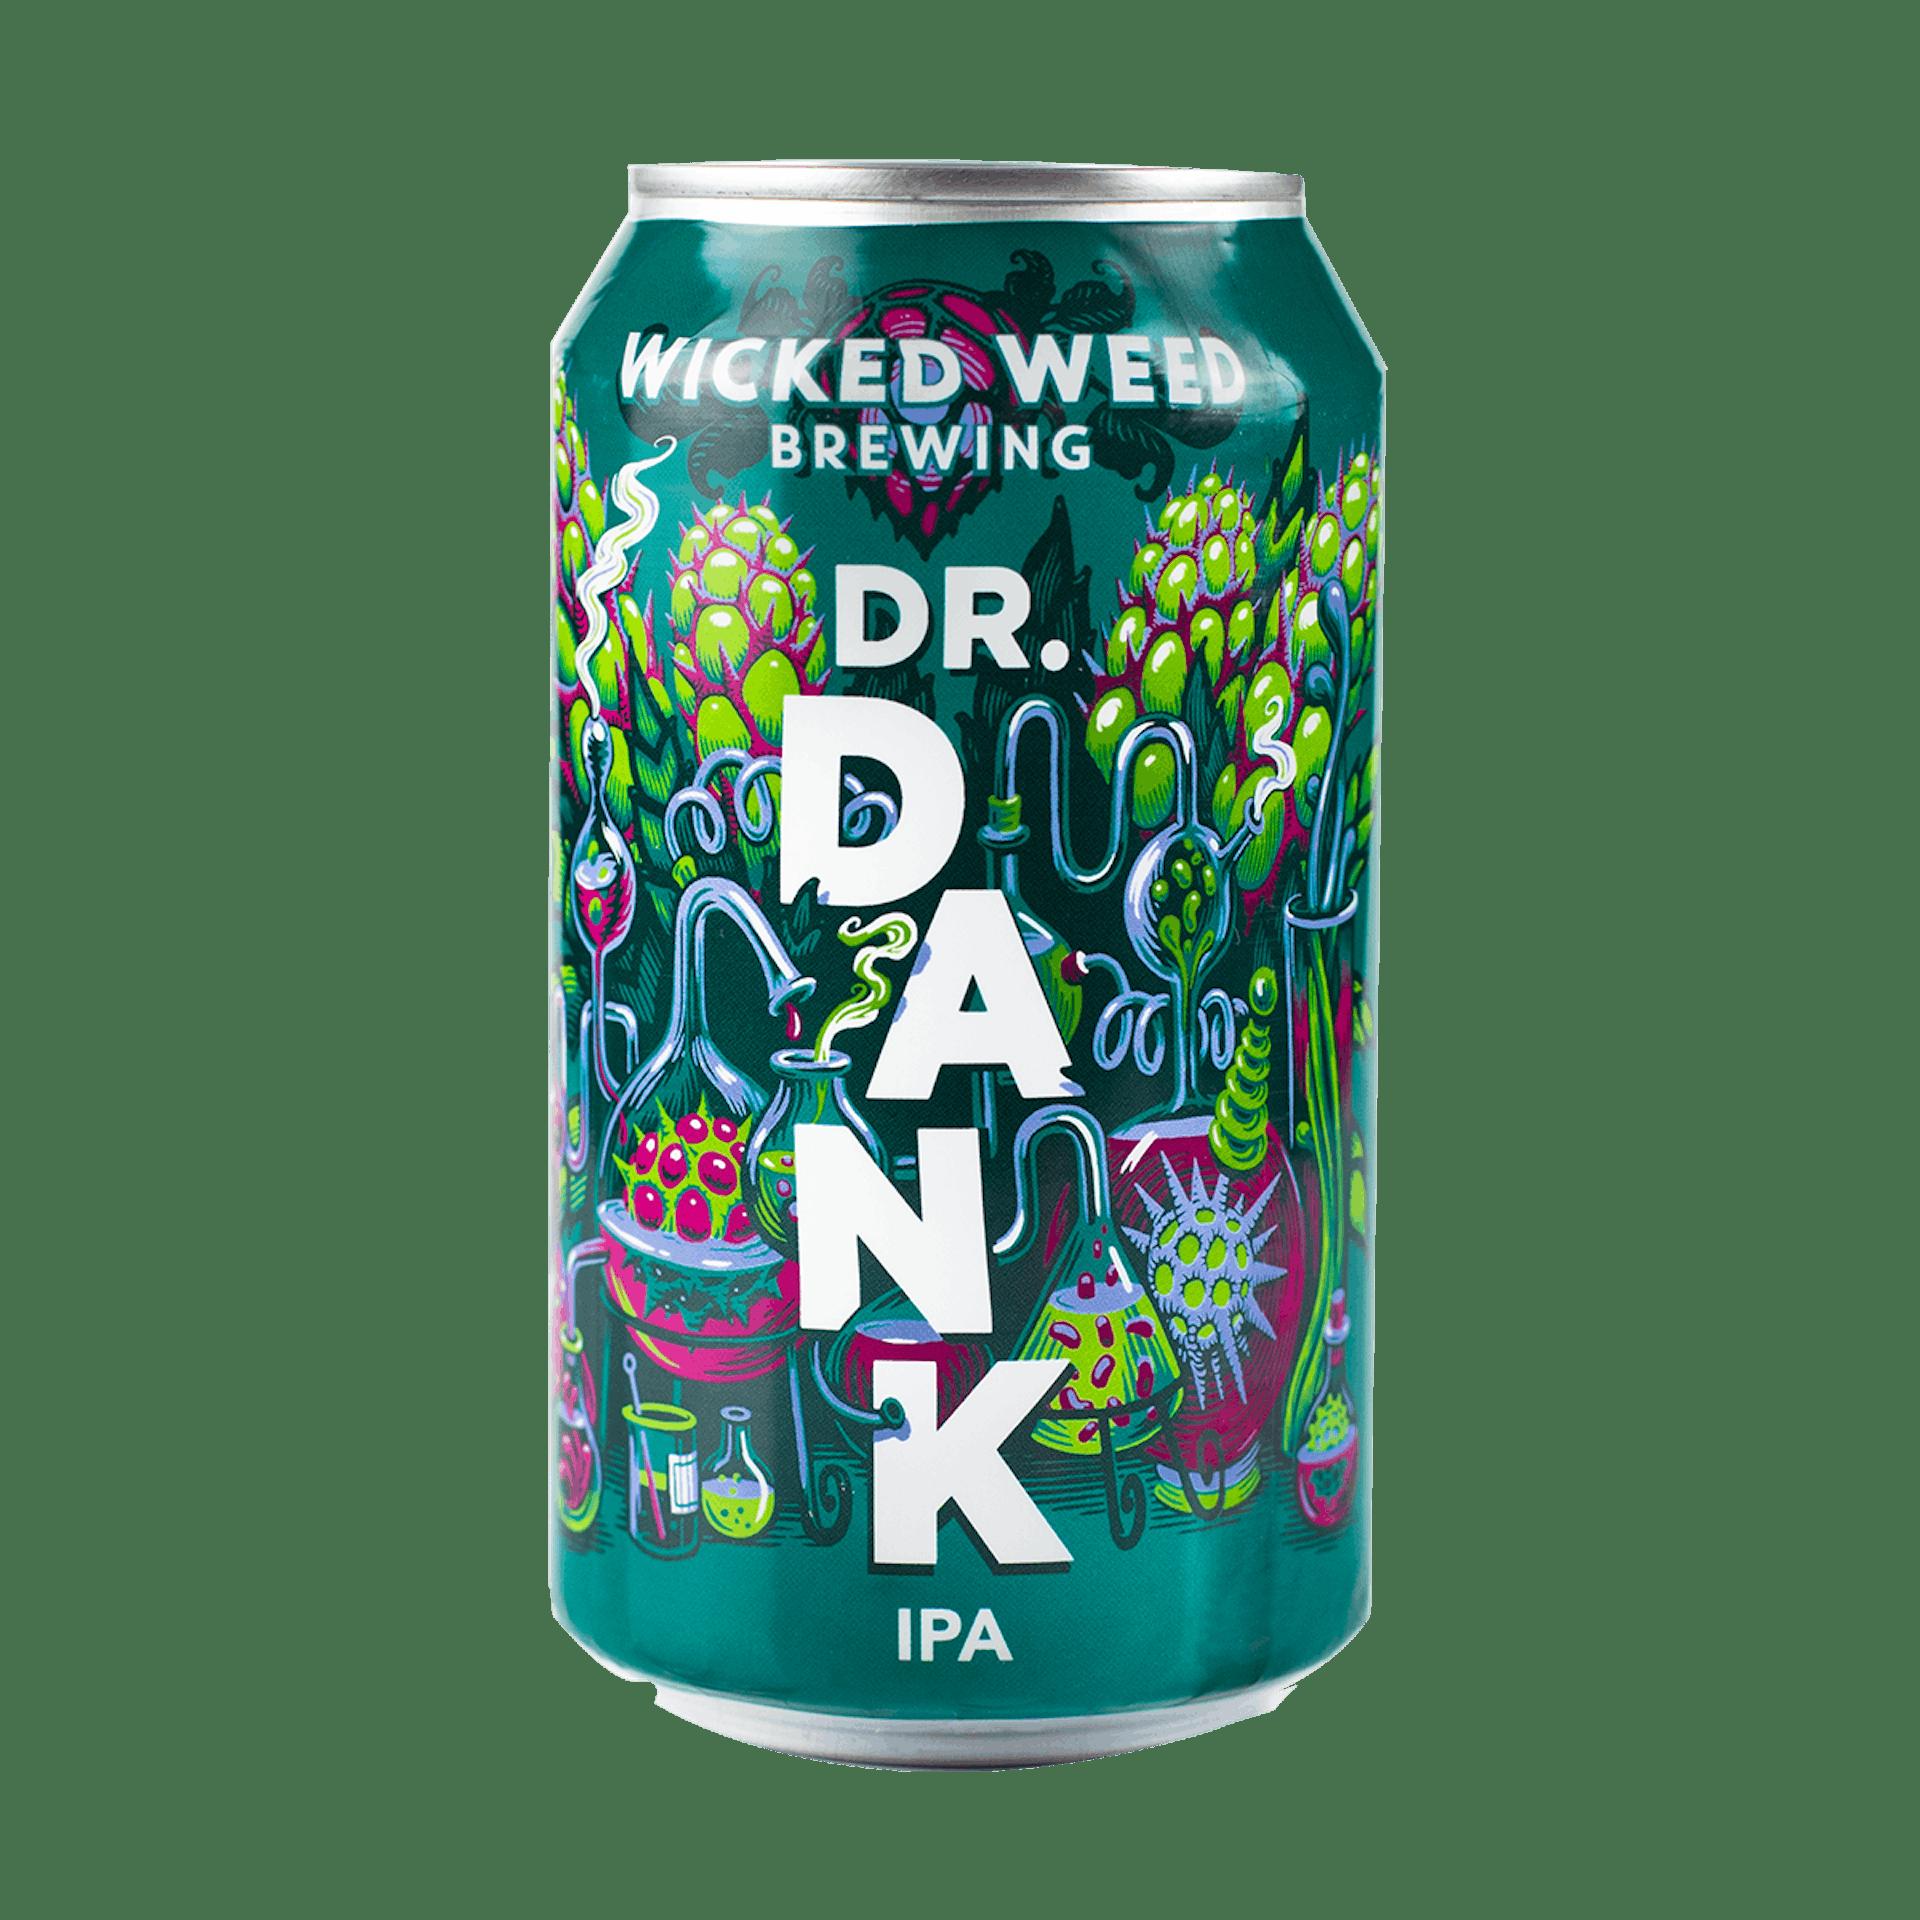 DrDankSizedForWeb